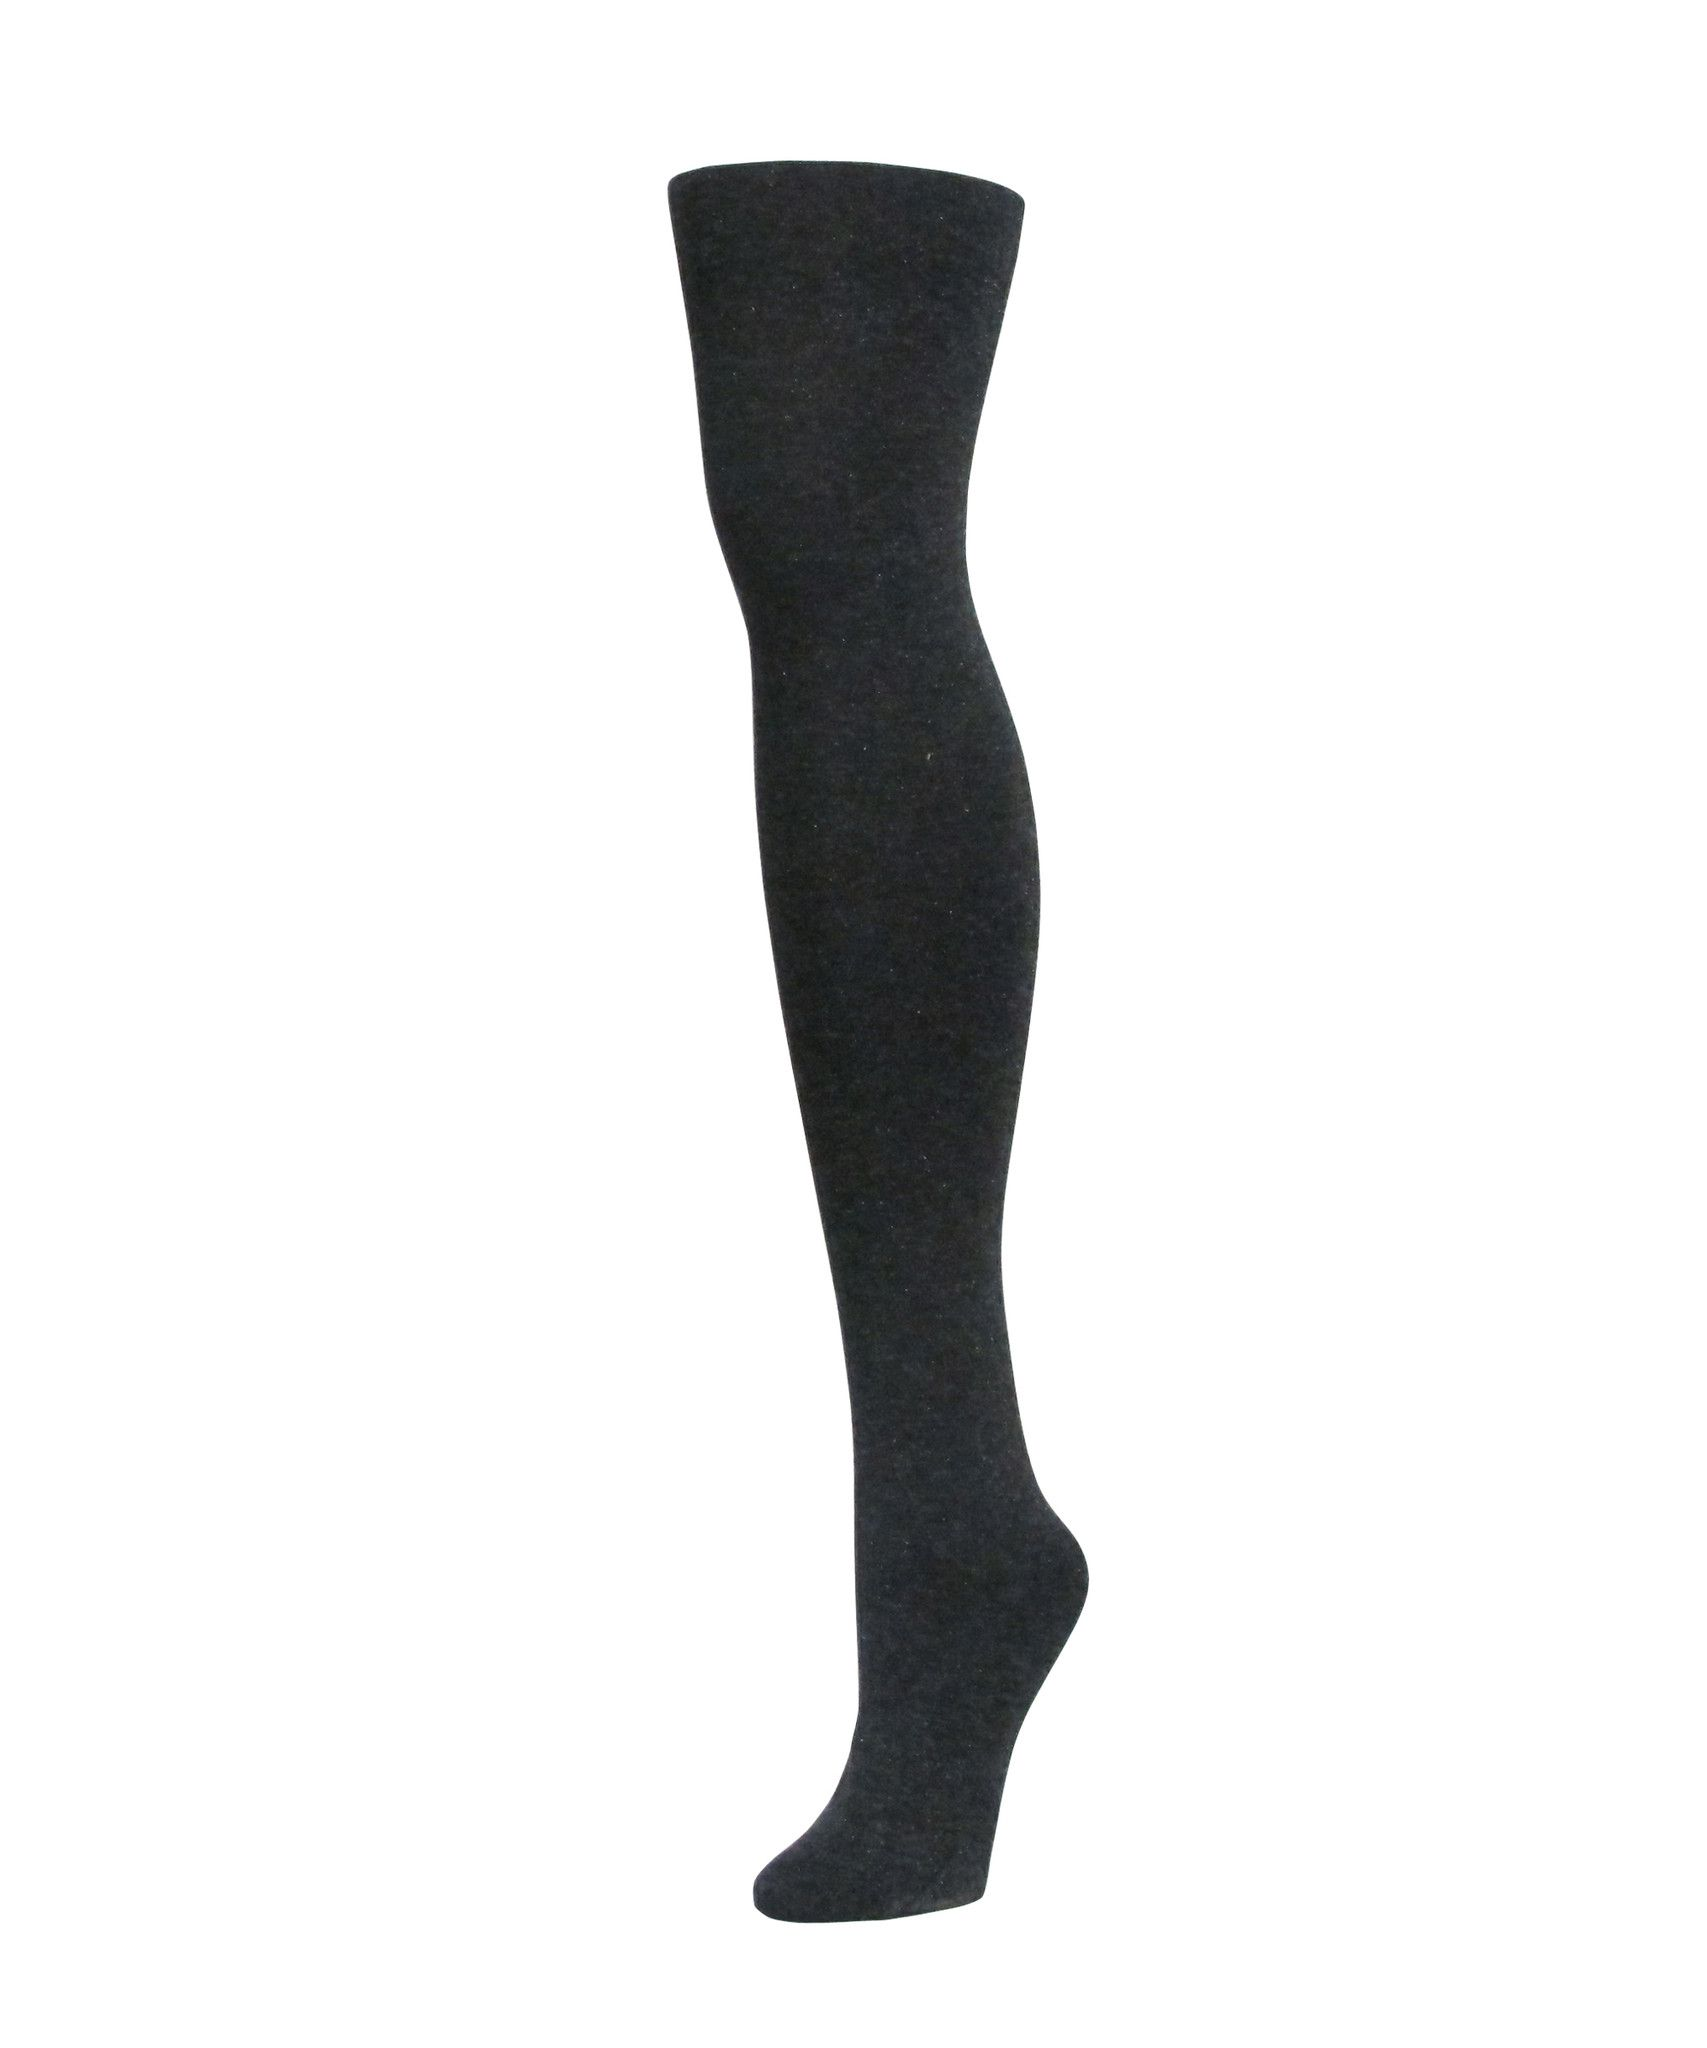 MeMoi - Shiny Sweater Tights #shapewear #leggings #strapless #corsetfemalebodyshaper #lingeriecollections